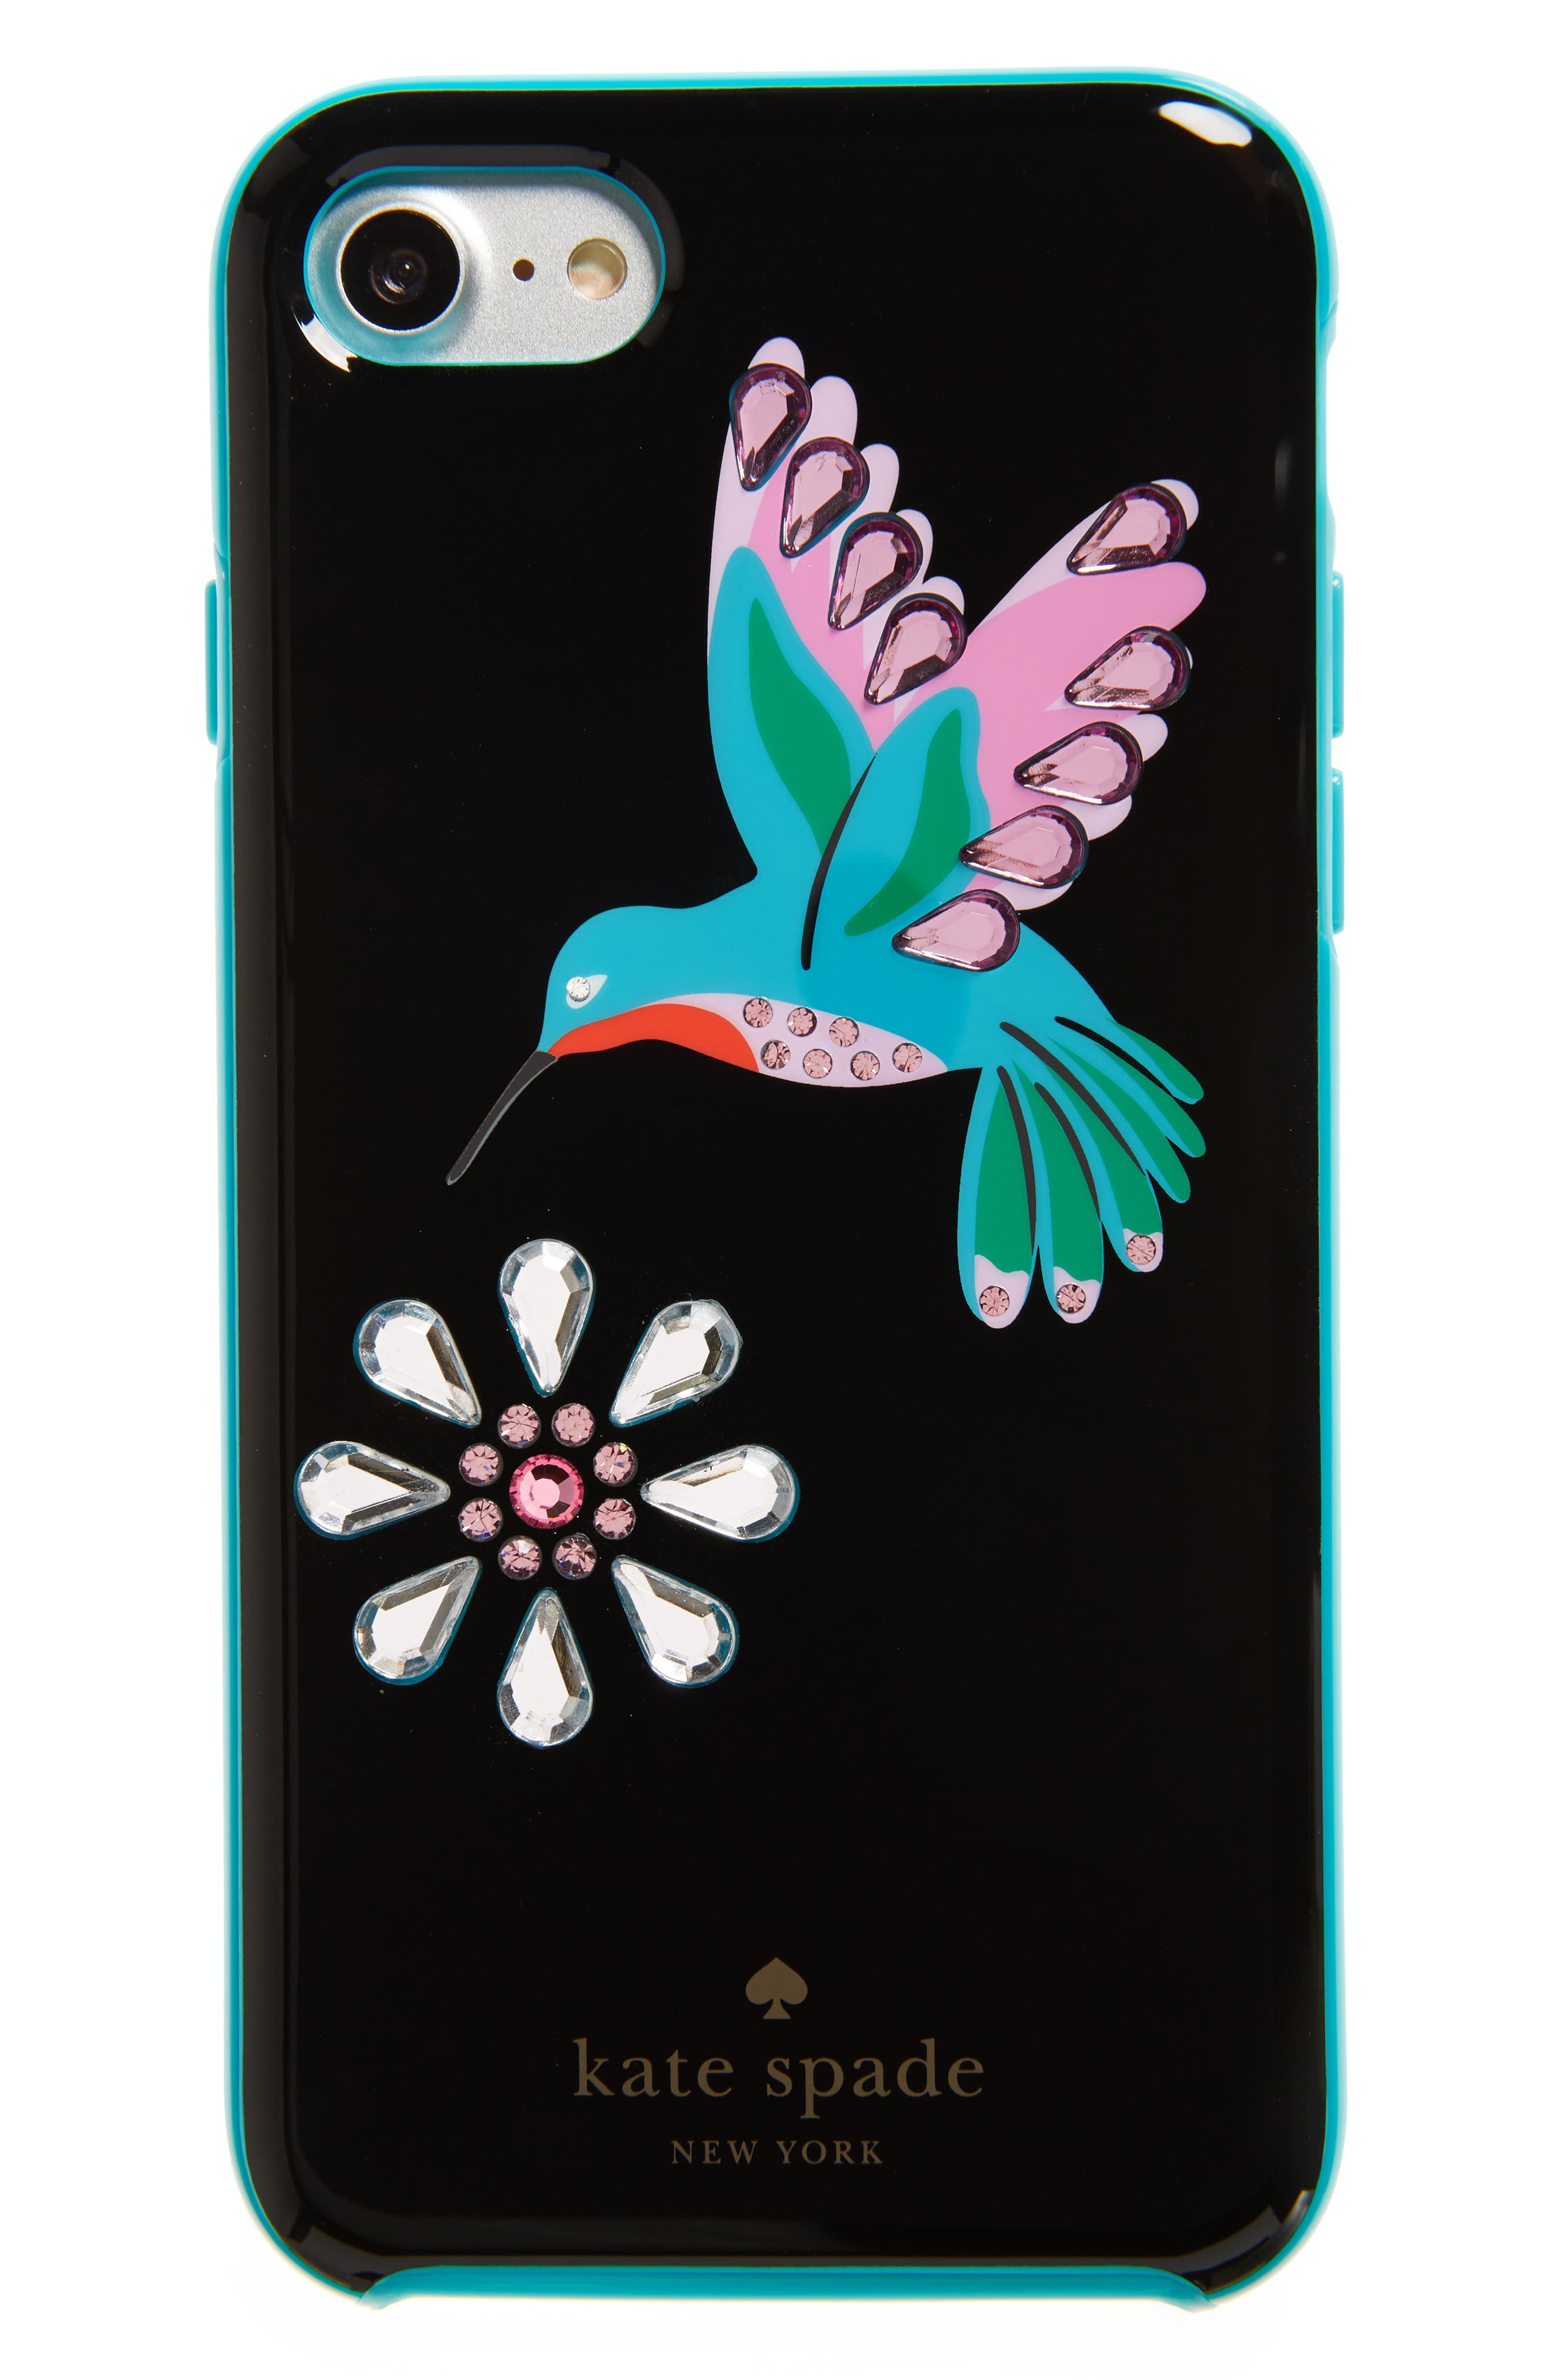 kate spade new york jeweled hummingbird iPhone 7 & 7 Plus case